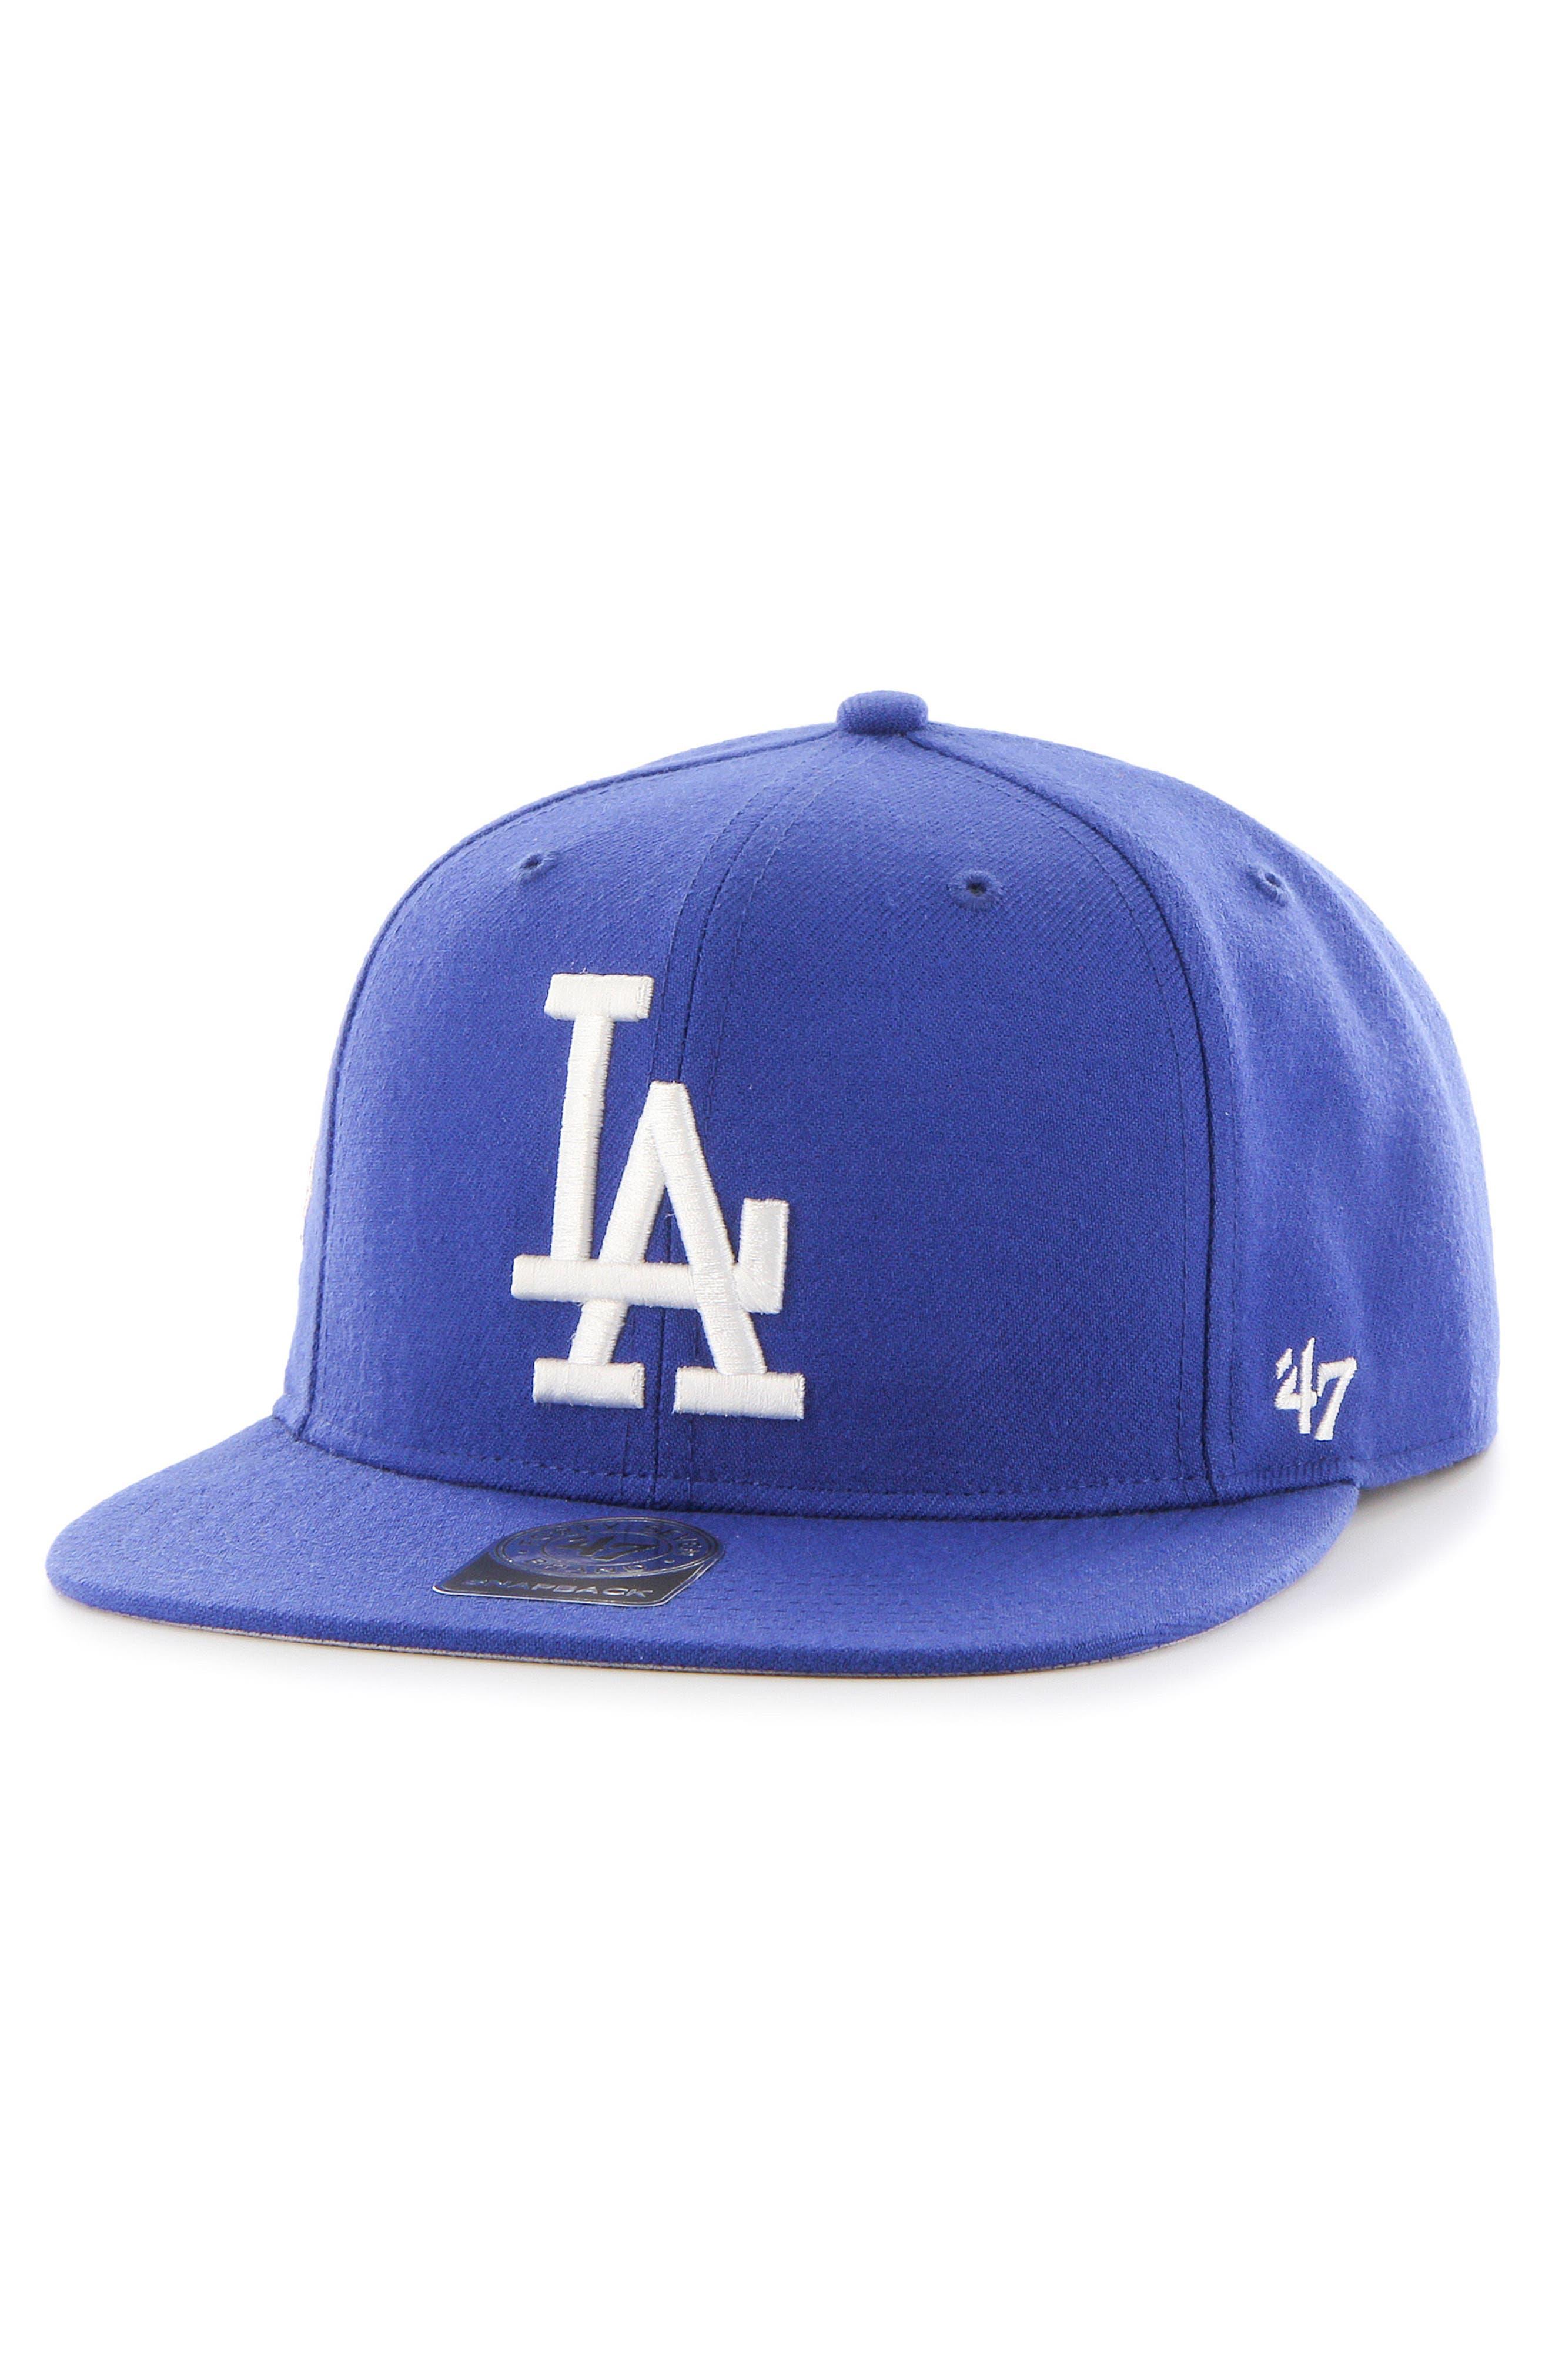 Main Image - 47 Brand LA Dodgers Sure Shot Captain Baseball Cap